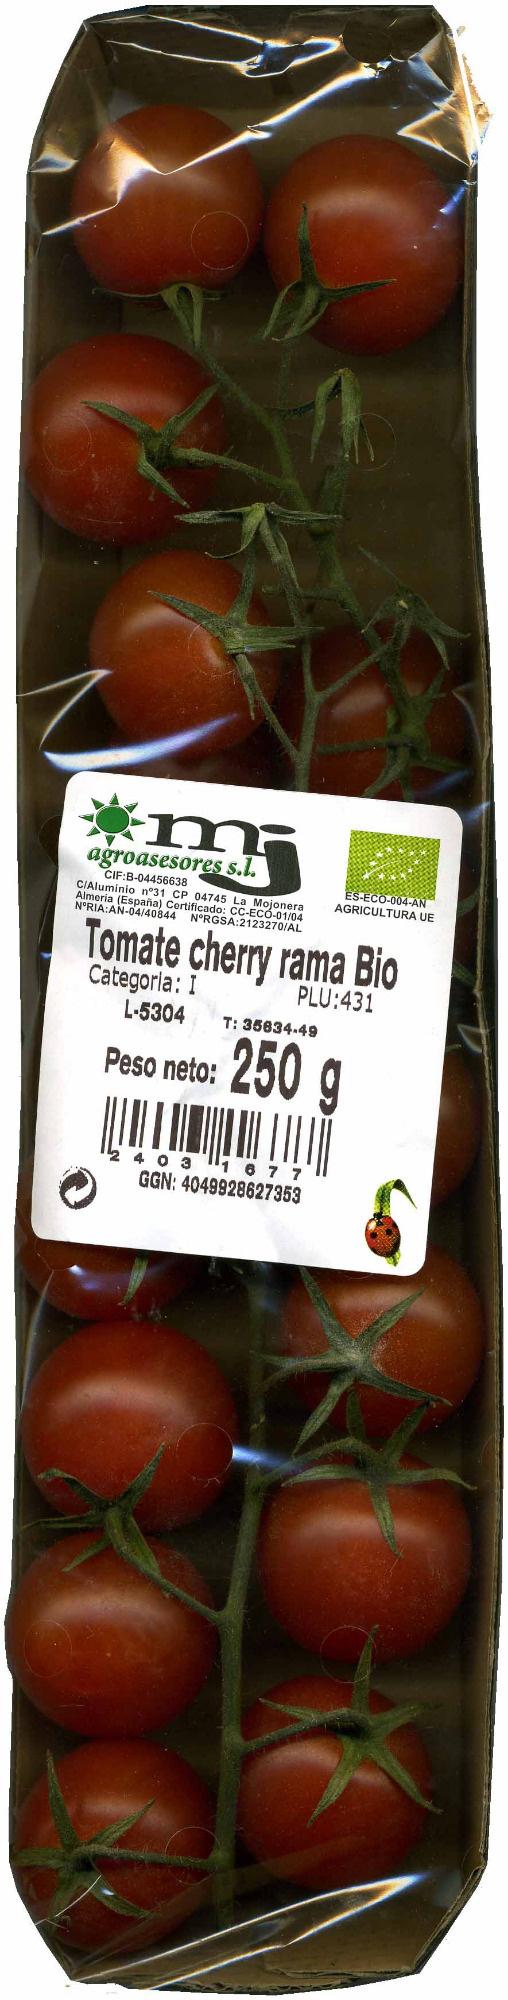 Tomate Cherry Rama Ecológico - Produkt - es